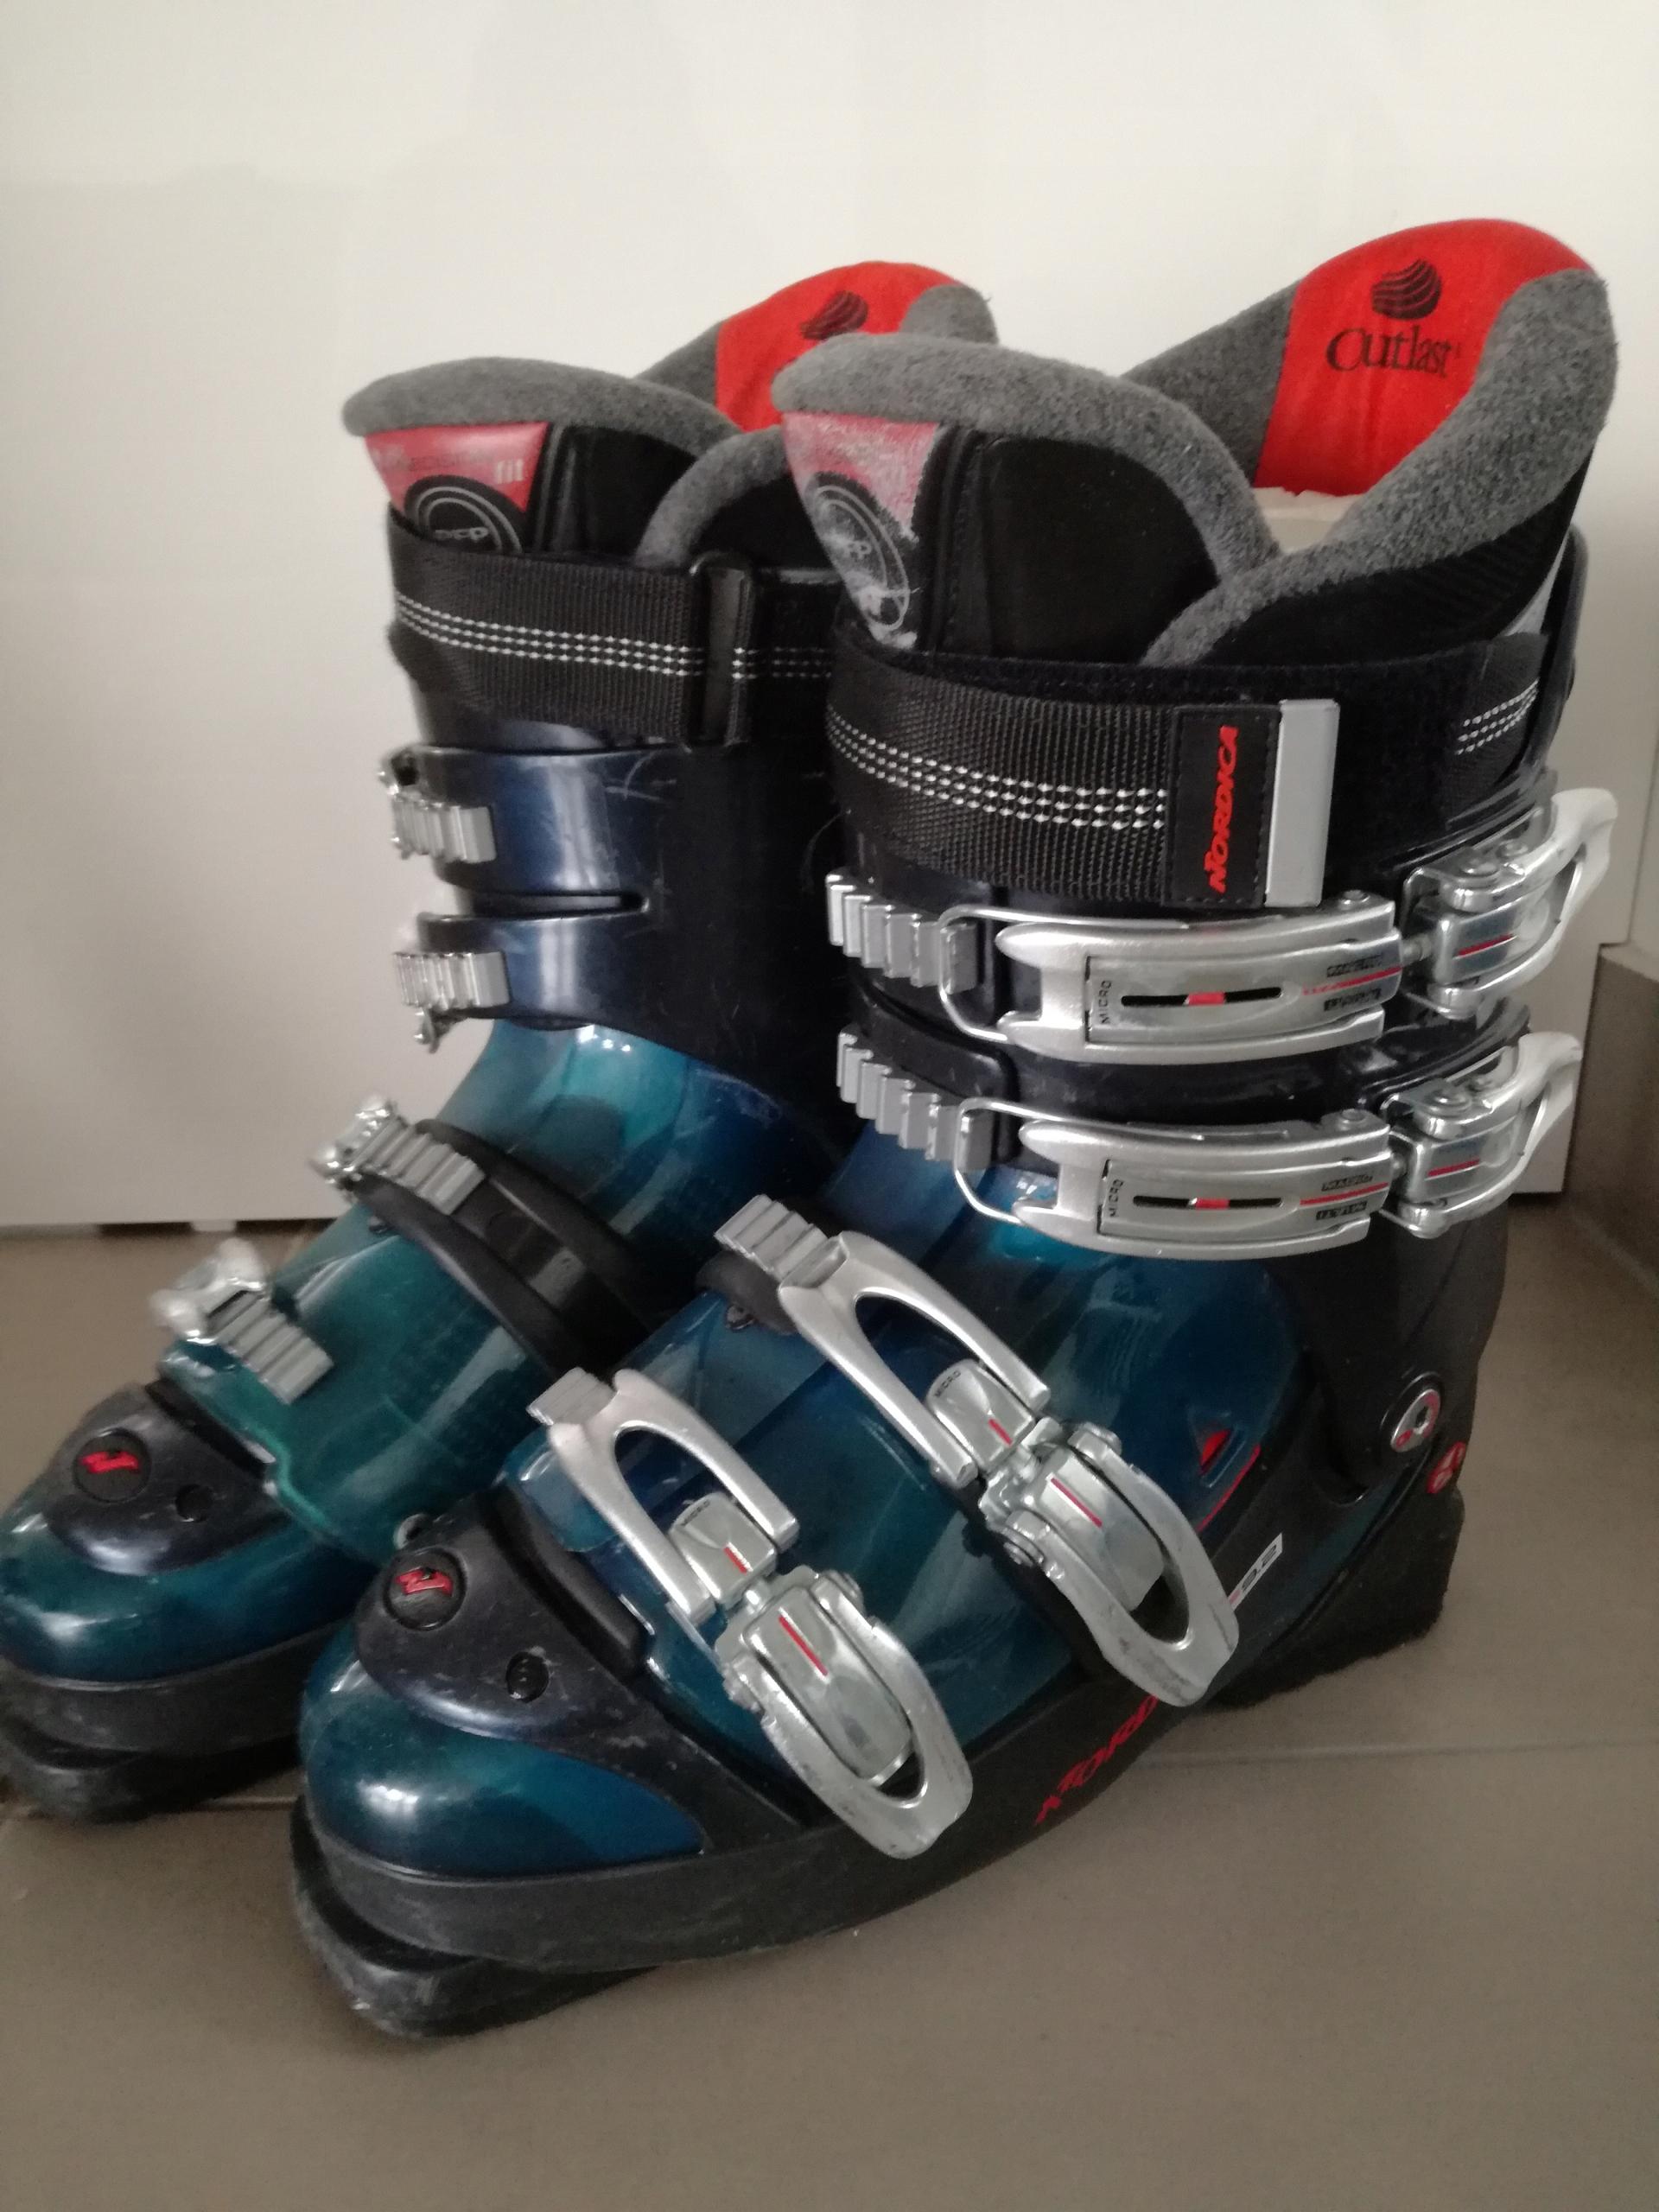 Buty narciarskie męskie Nordica F9.2 r. 26 cm